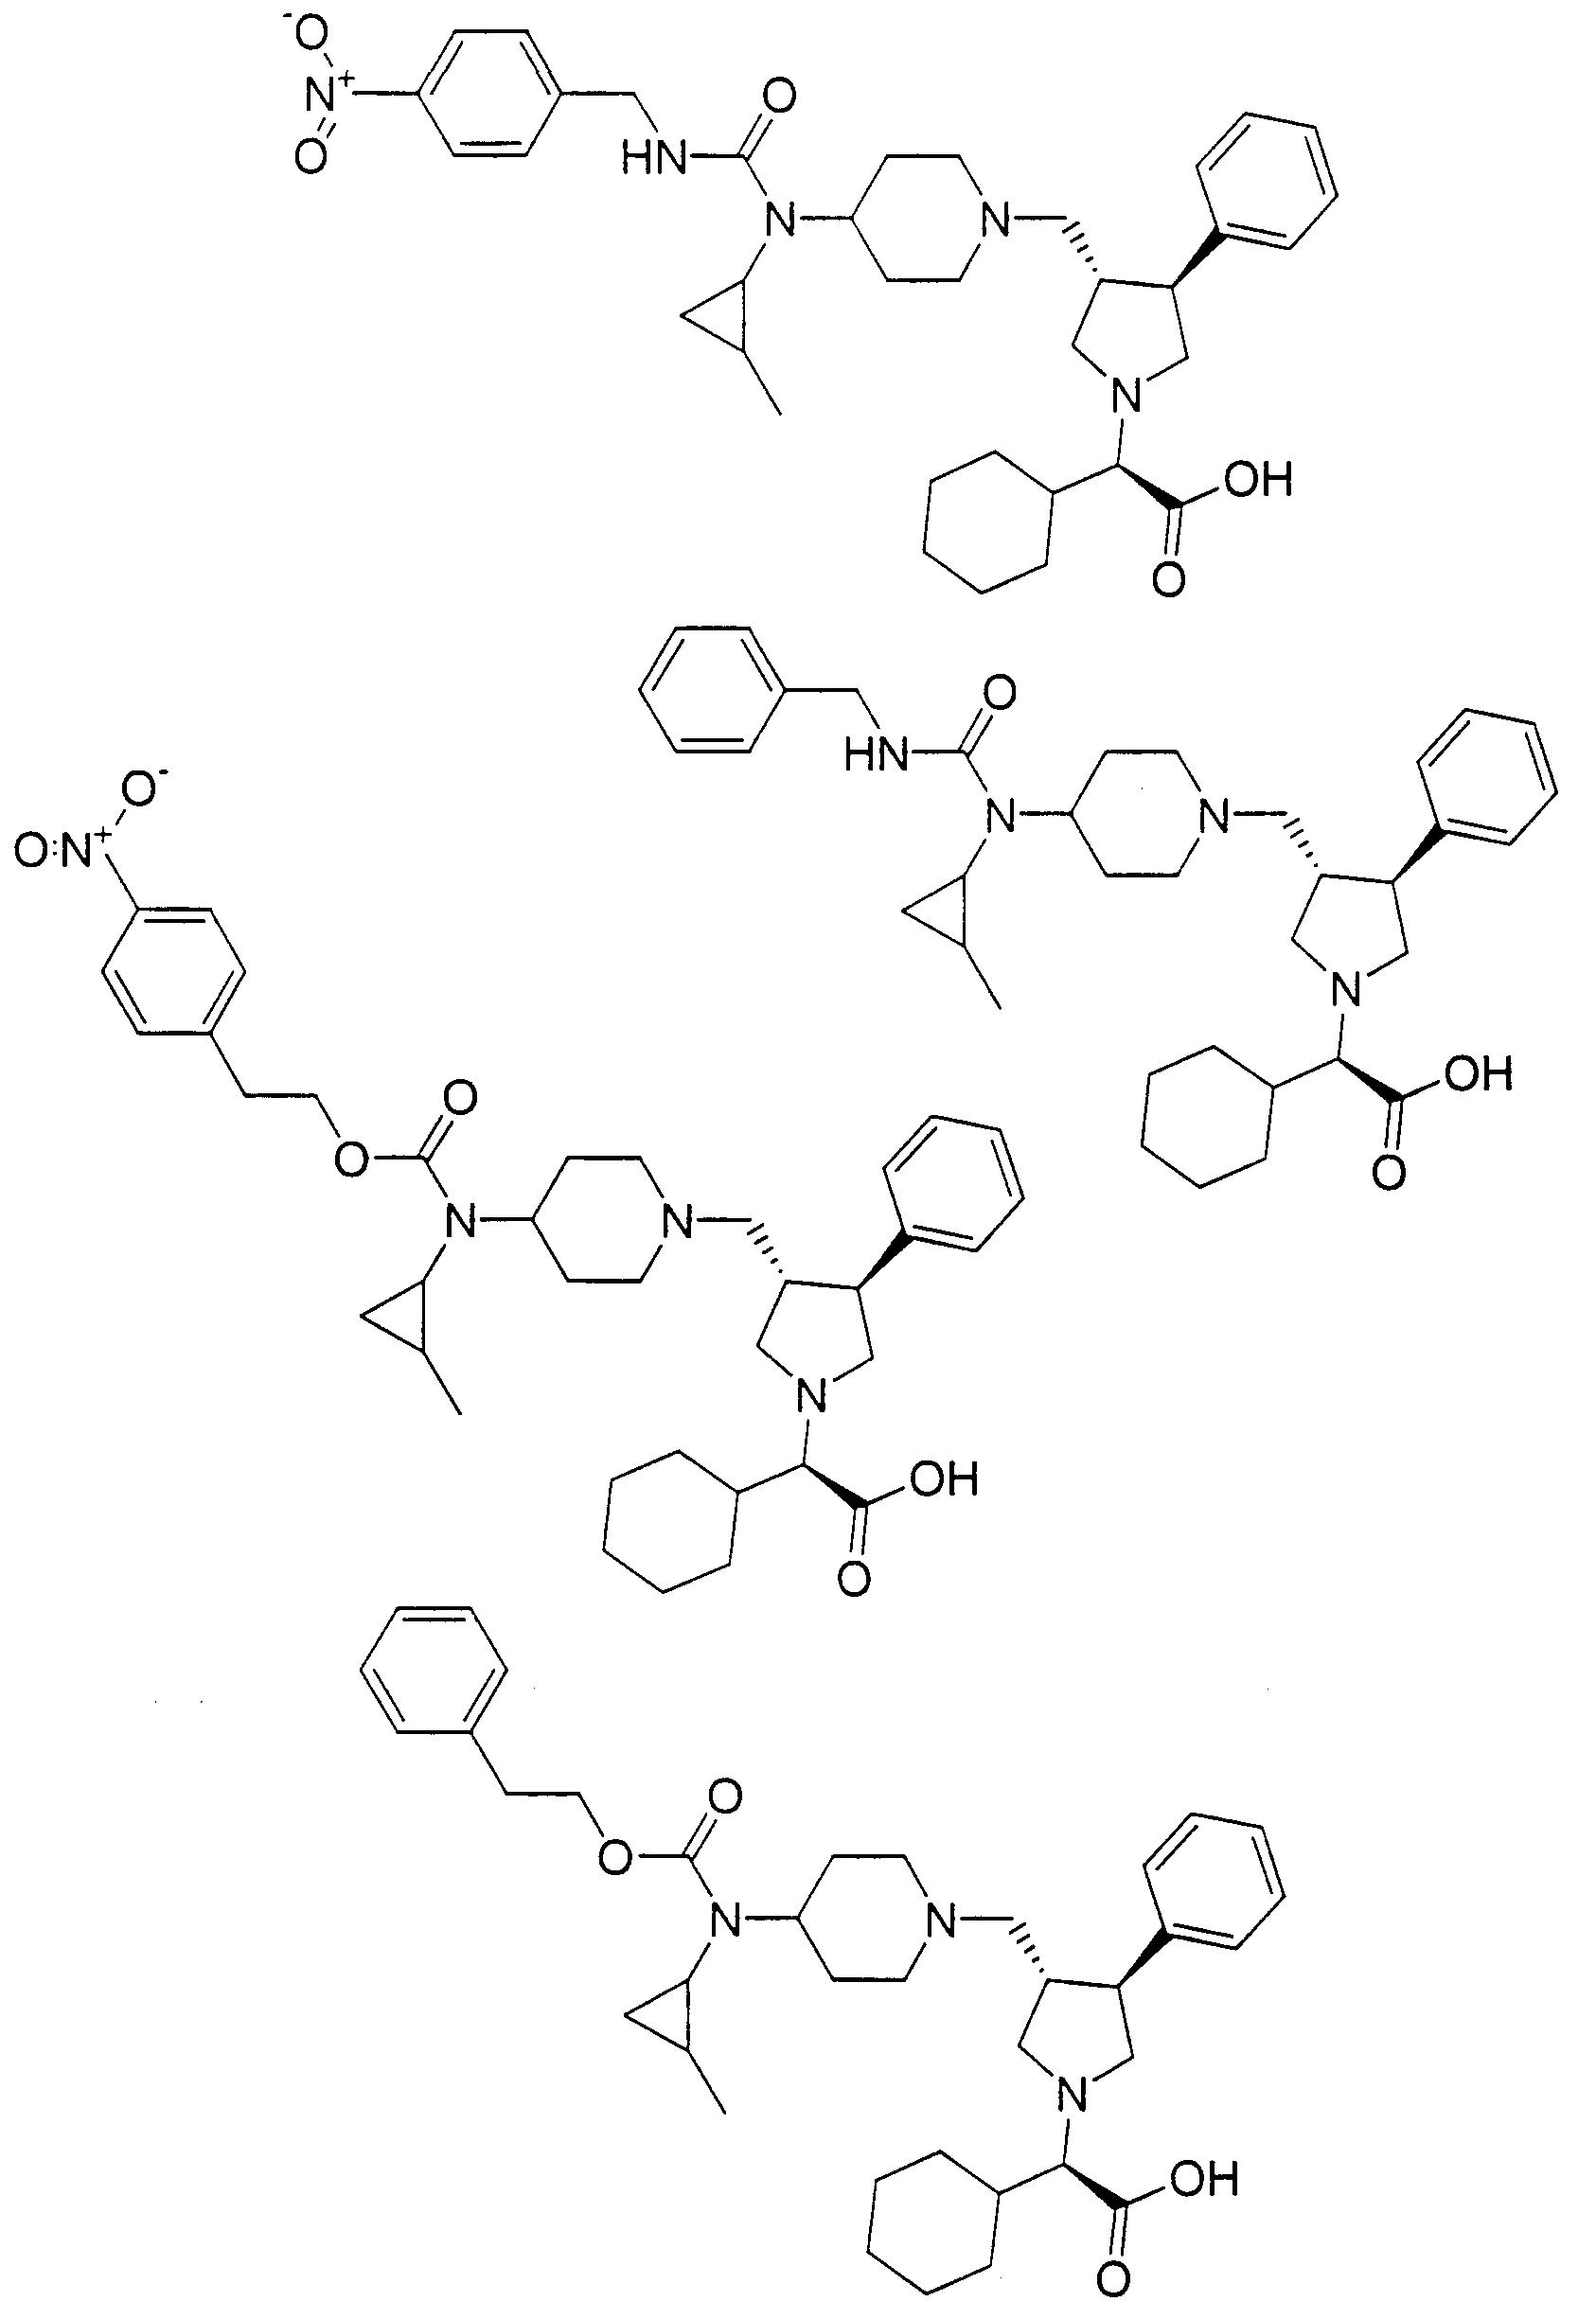 wo2000059497a1 pyrrolidine modulators of chemokine receptor Electrical Connectors Product figure imgf000067 0001